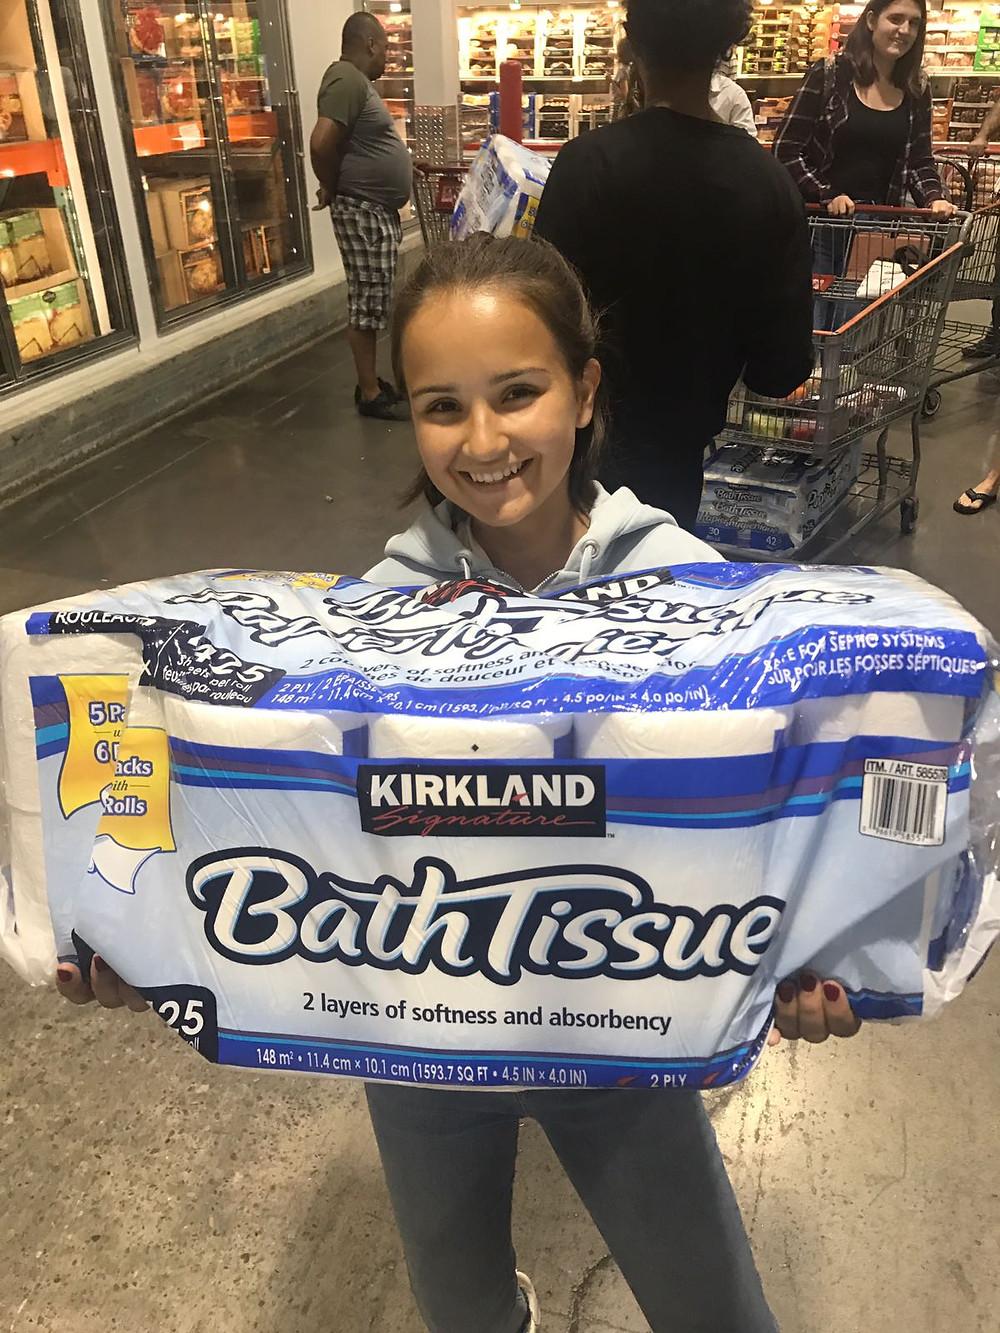 When you buy toilet paper in Costco...